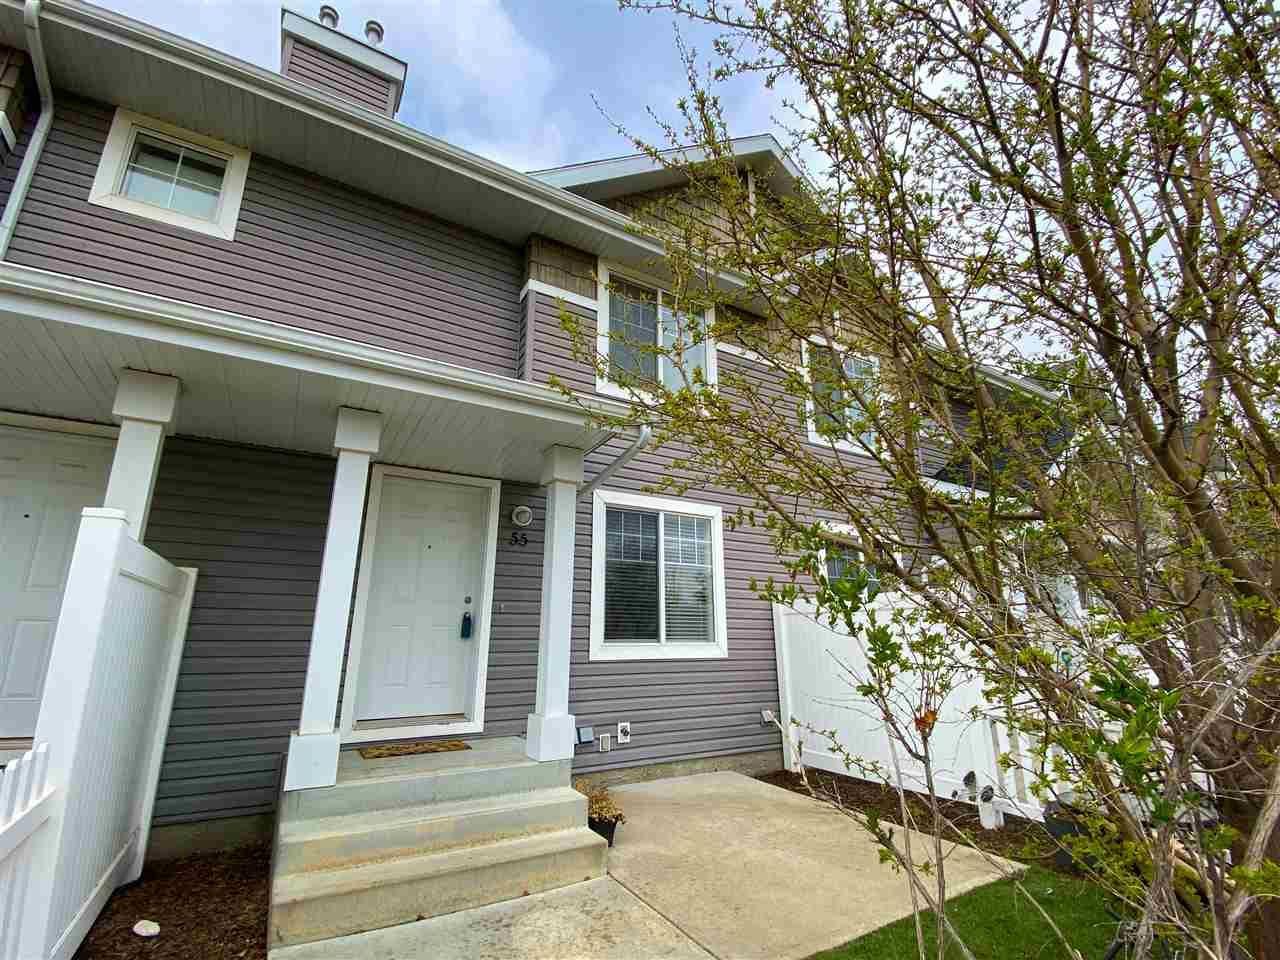 Main Photo: 55 3075 TRELLE Crescent in Edmonton: Zone 14 Townhouse for sale : MLS®# E4242100